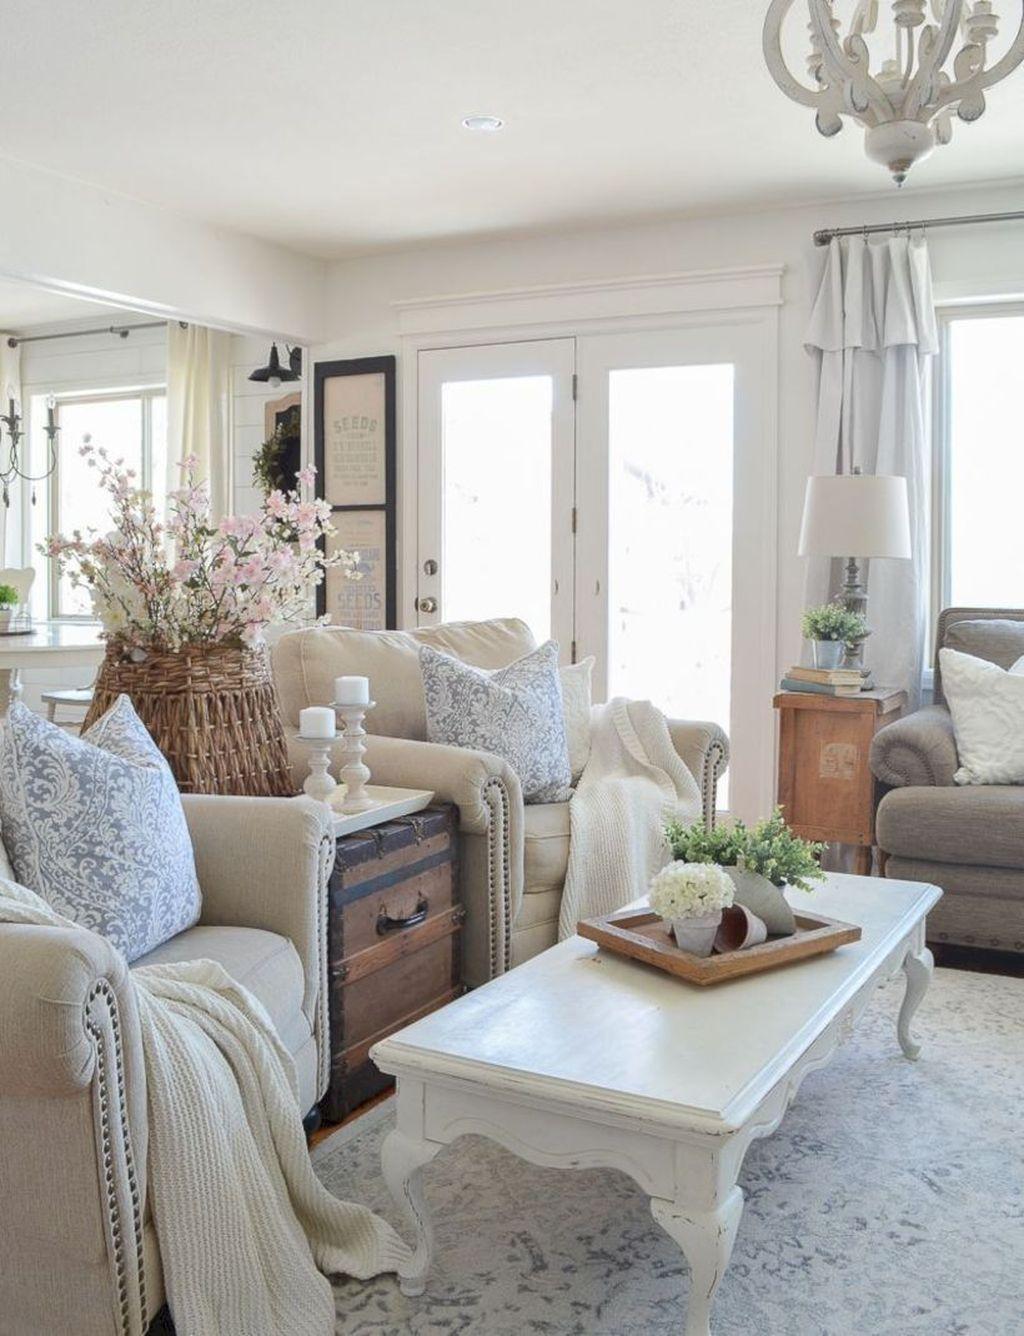 Cool 20+ Fabulous Shabby Chic Farmhouse Living Room Decor ...